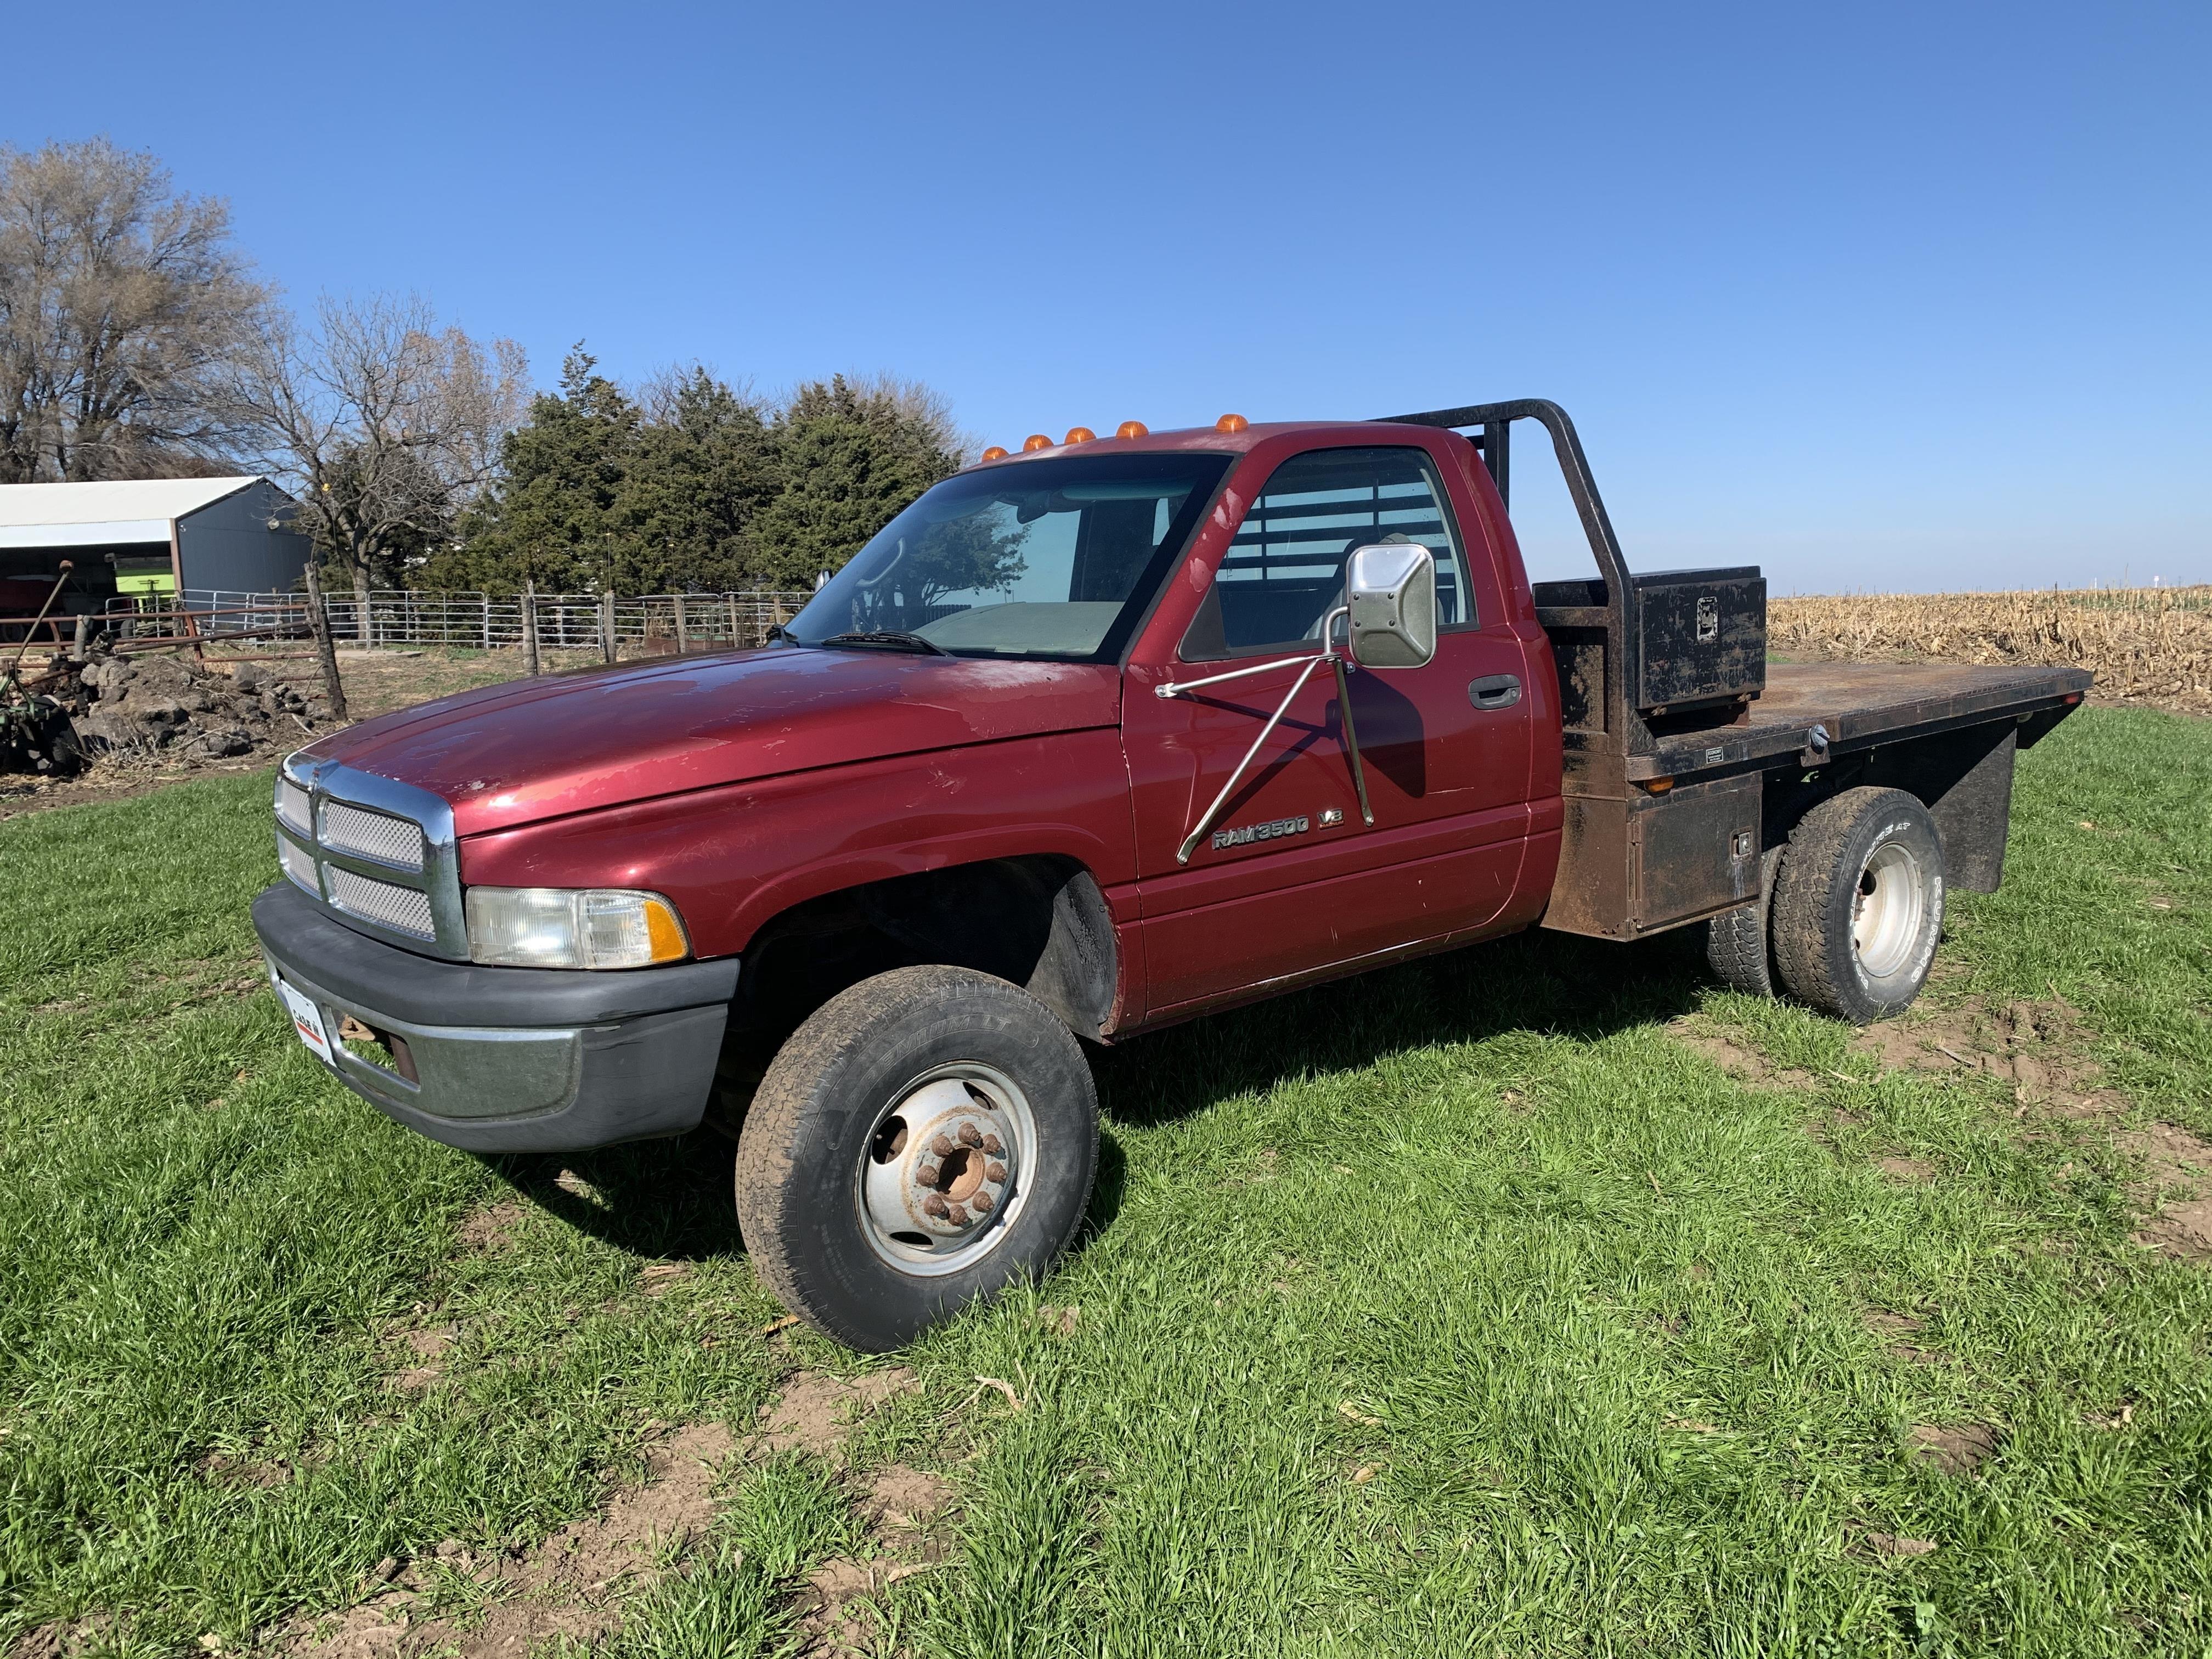 1996 Dodge Ram 3500 4x4 Dually Flatbed Pickup Bigiron Auctions